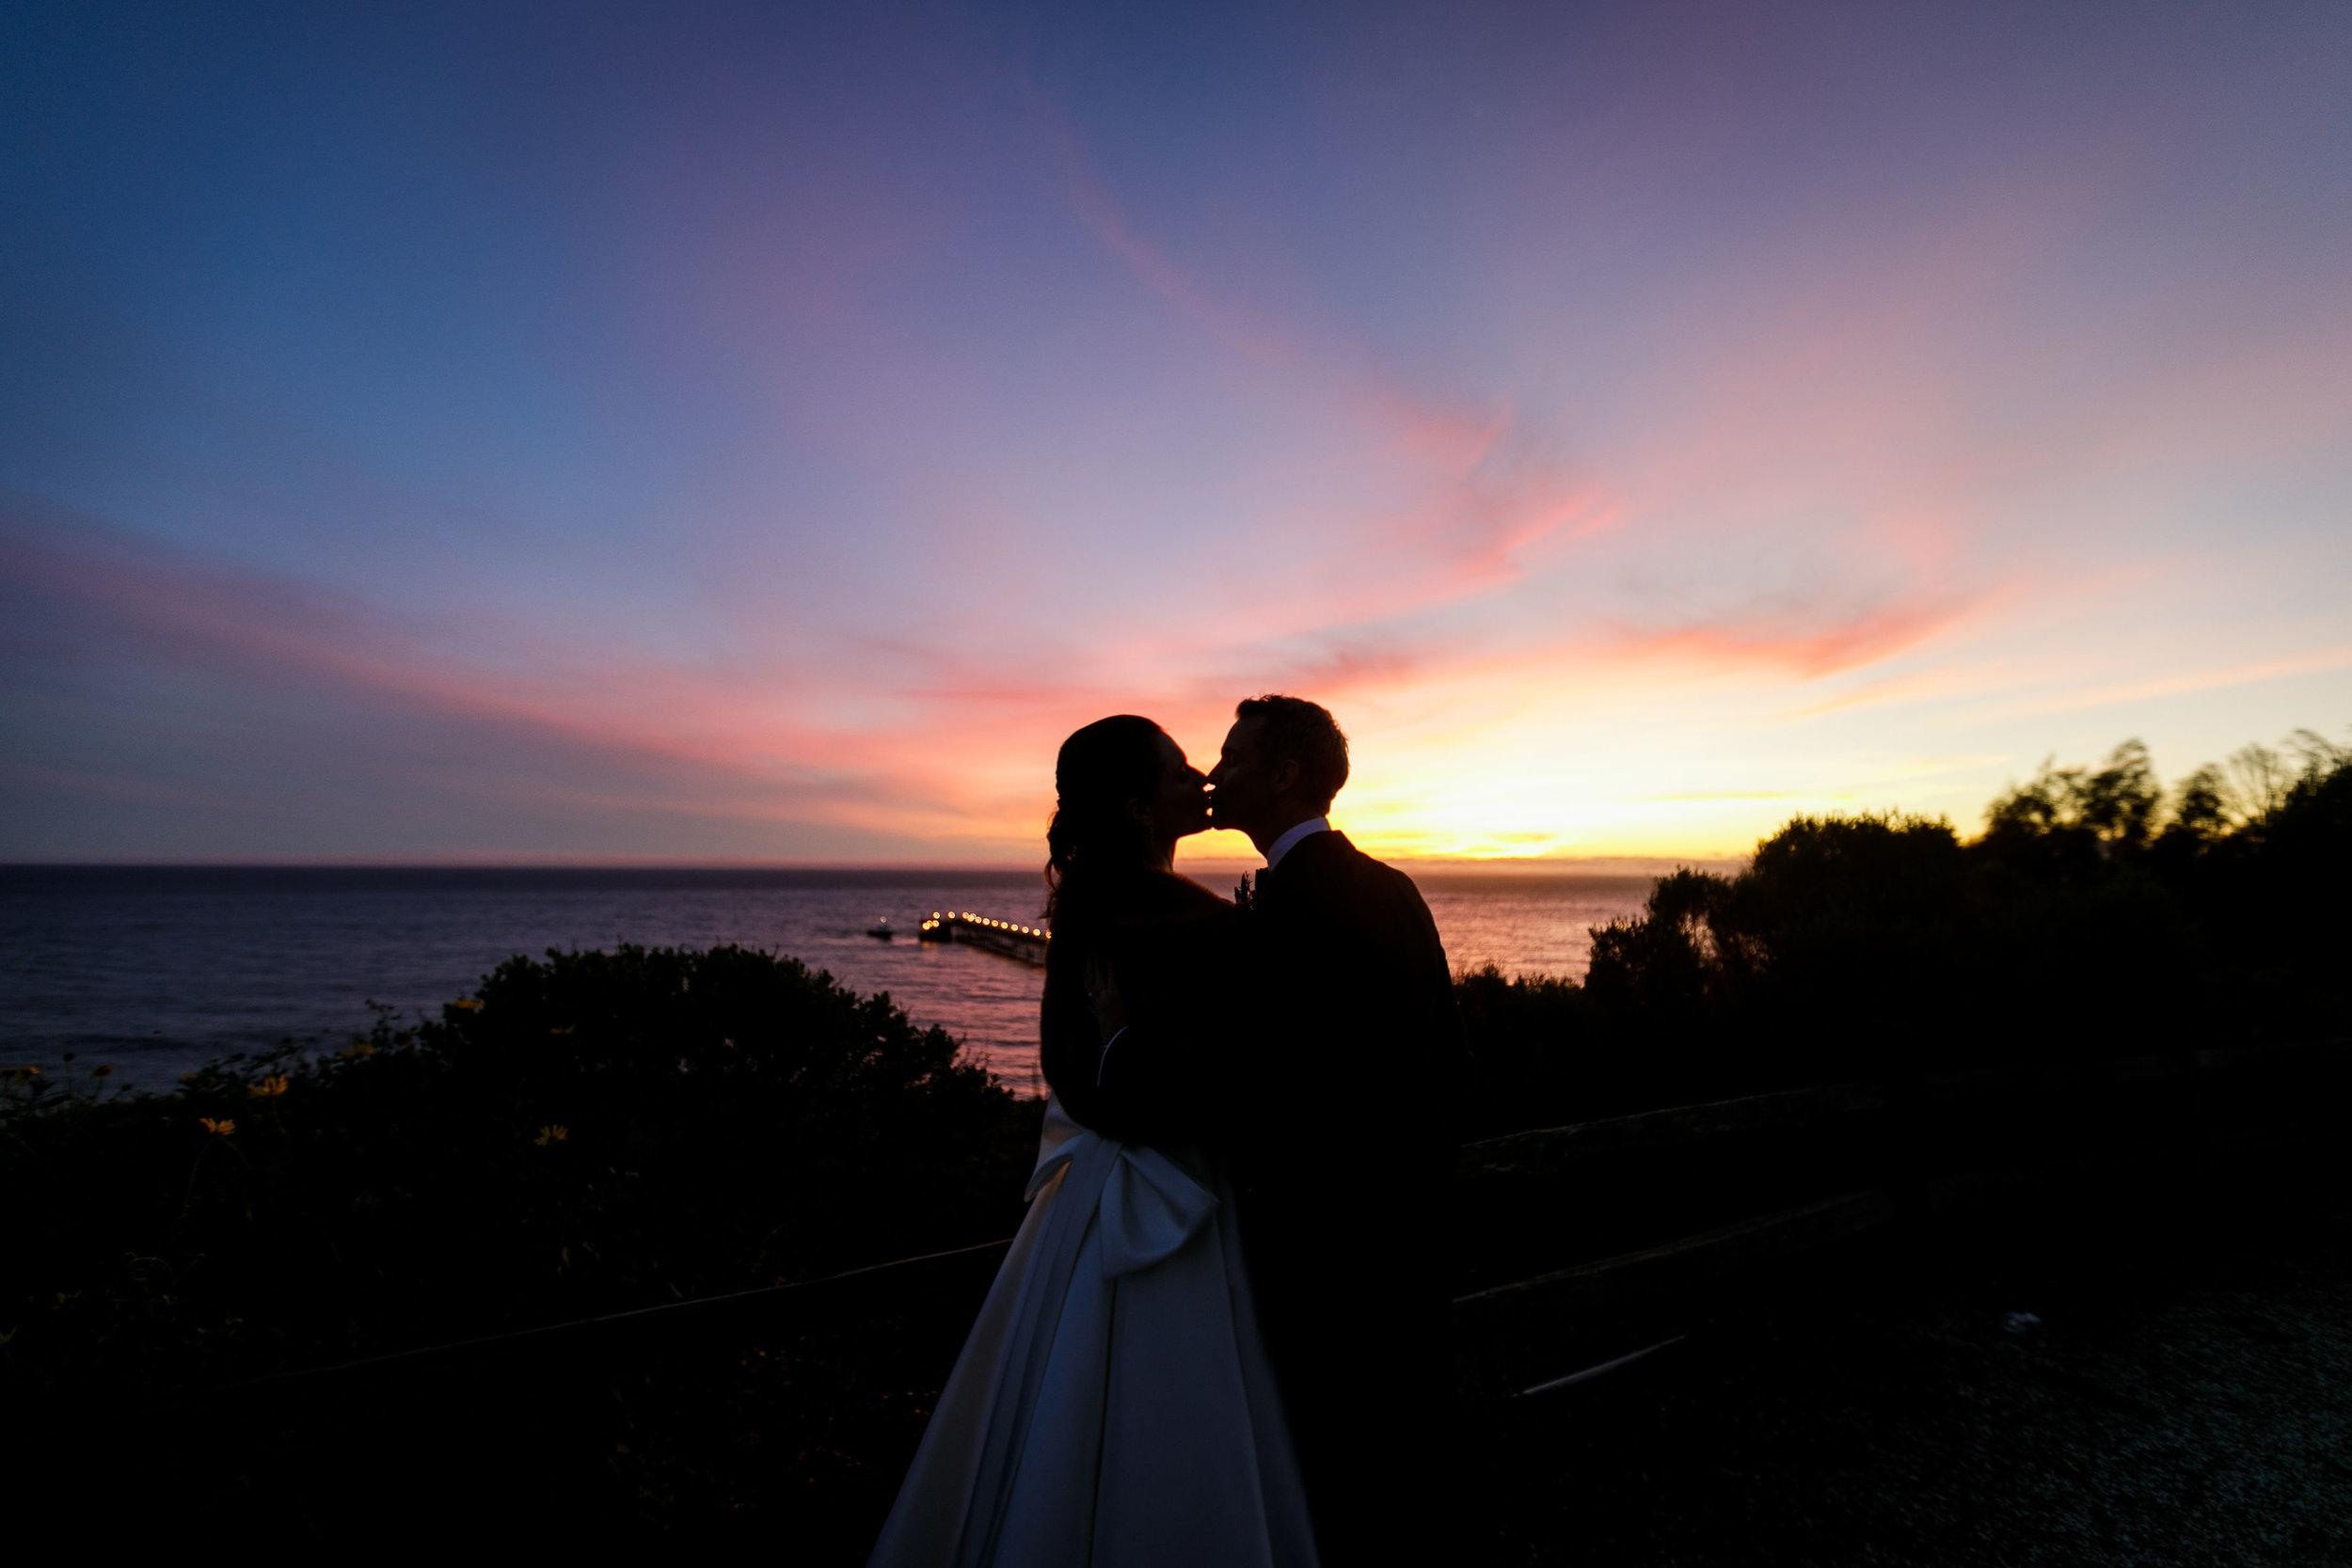 www.santabarbarawedding.com   Kiel Rucker Photography   The Ritz Carlton Bacara   Event of the Season   Sareh Nouri   Couple Kiss at Sunset